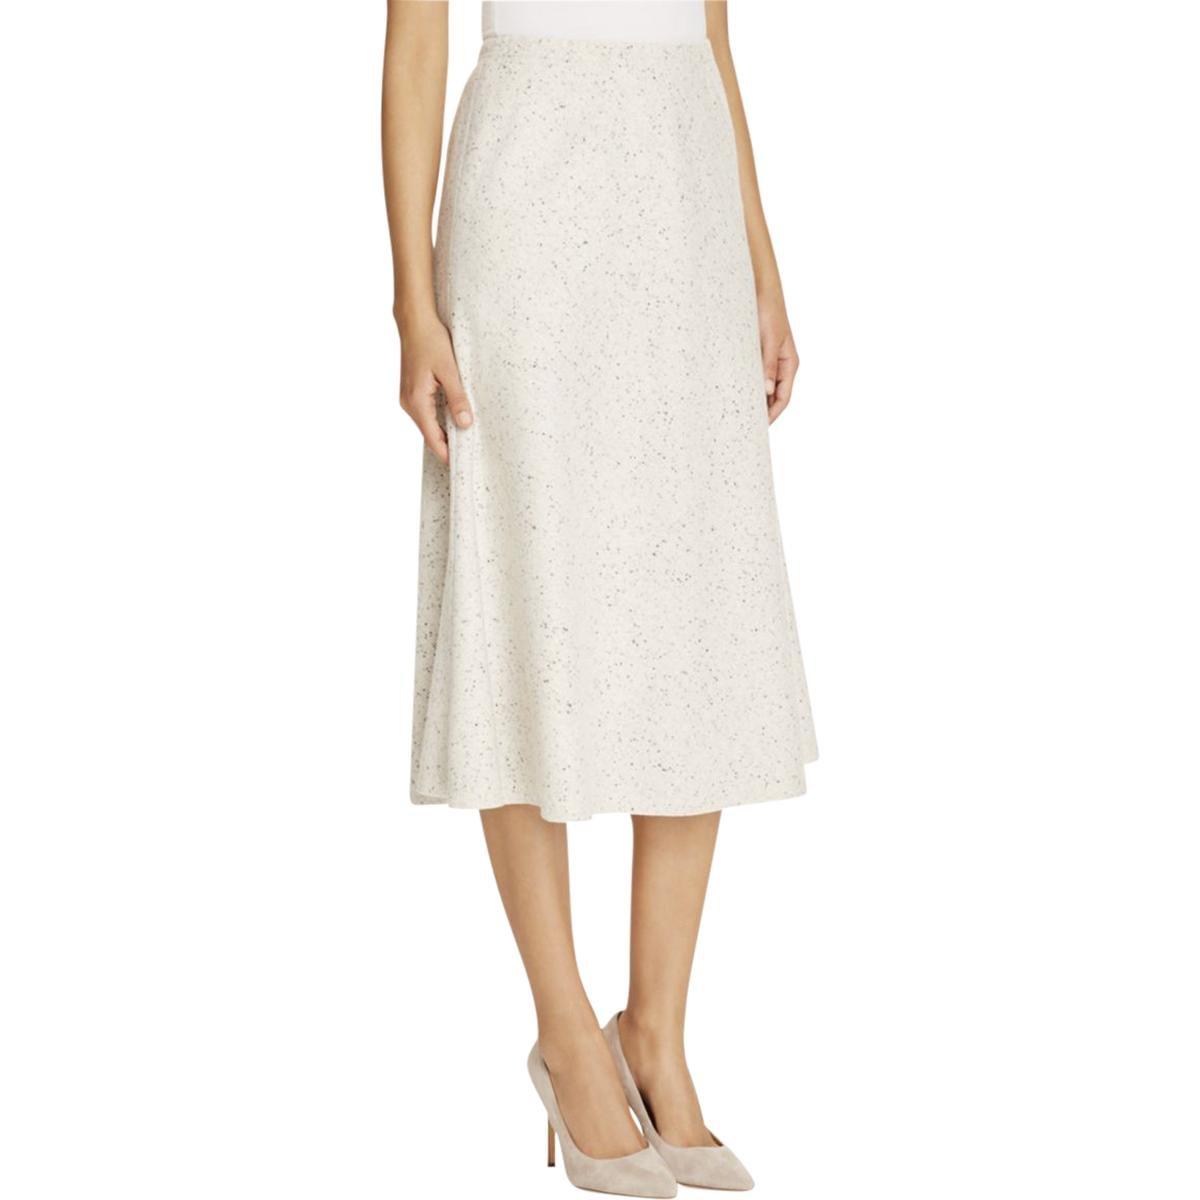 Lafayette 148 Womens Petites Woven Textured Tulip Skirt White P/S